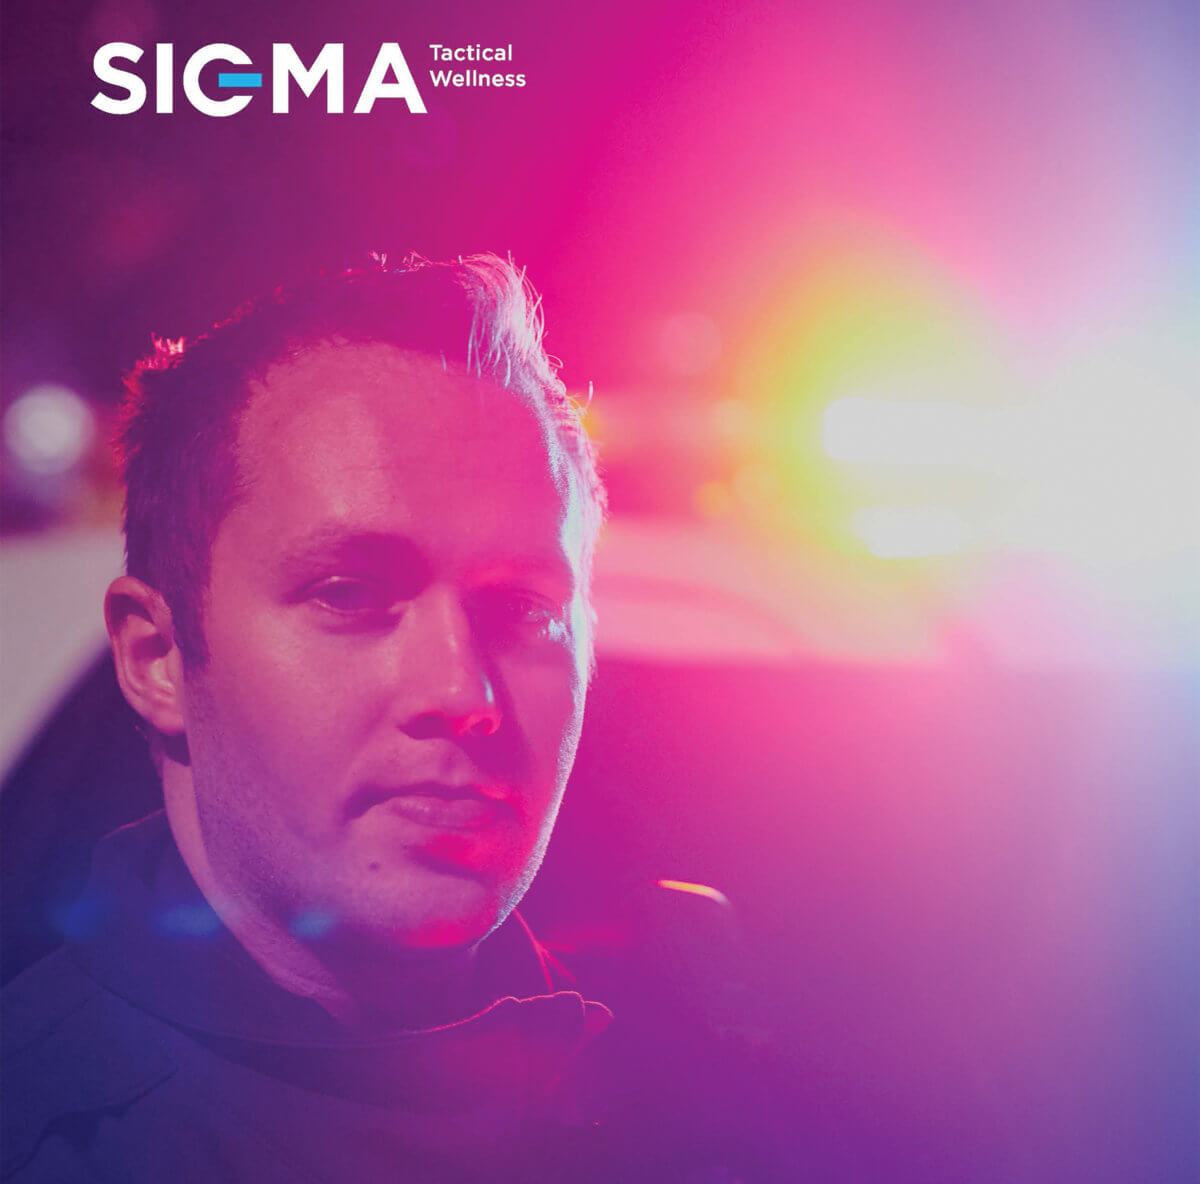 SIGMA Tactical Wellness